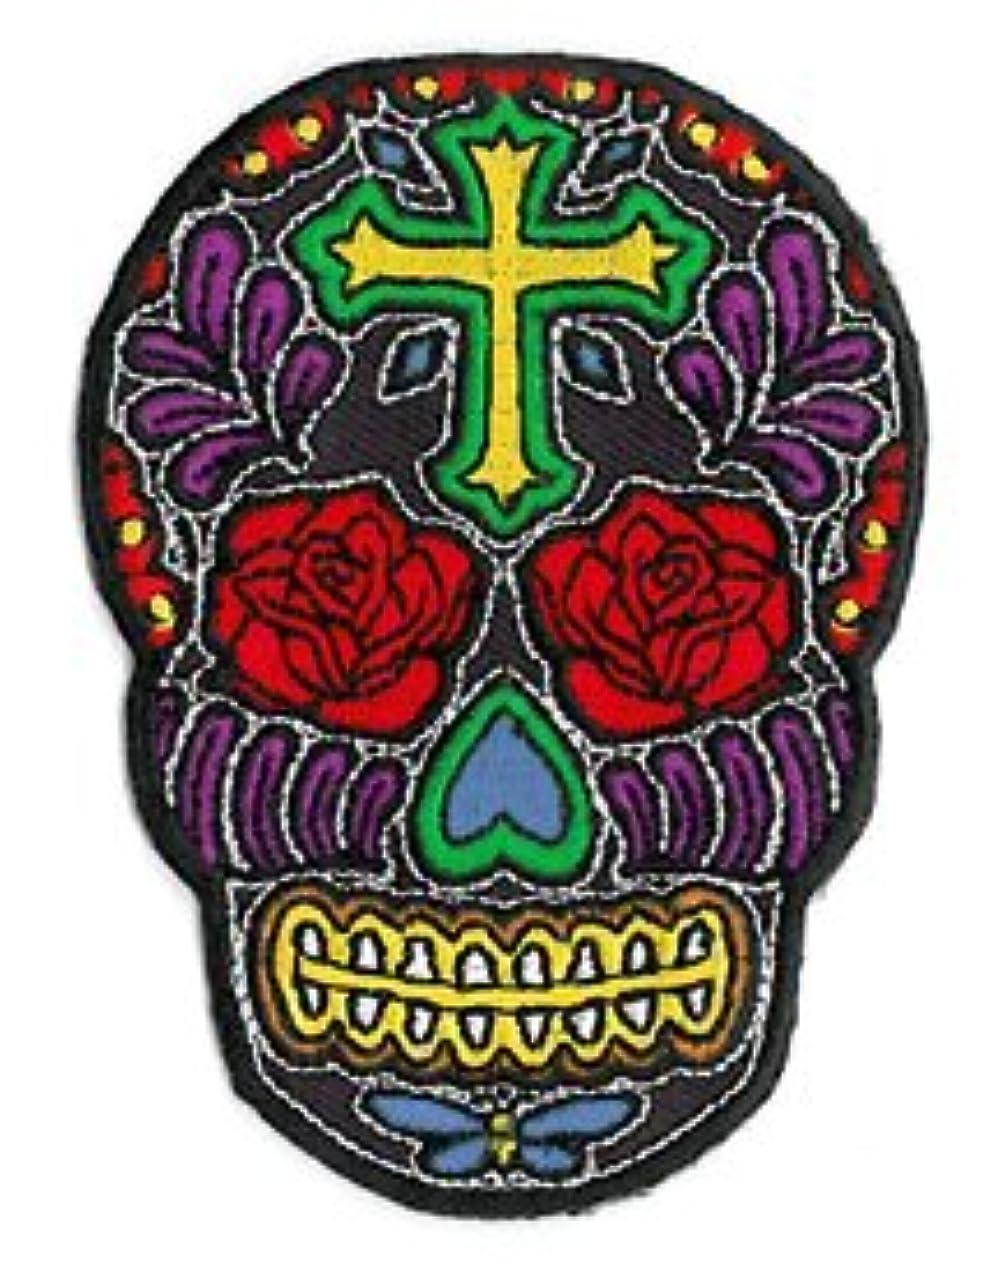 Novelty Iron On Patch - Cross Sugar Skull Face w/ Rose Flower Eyes Applique